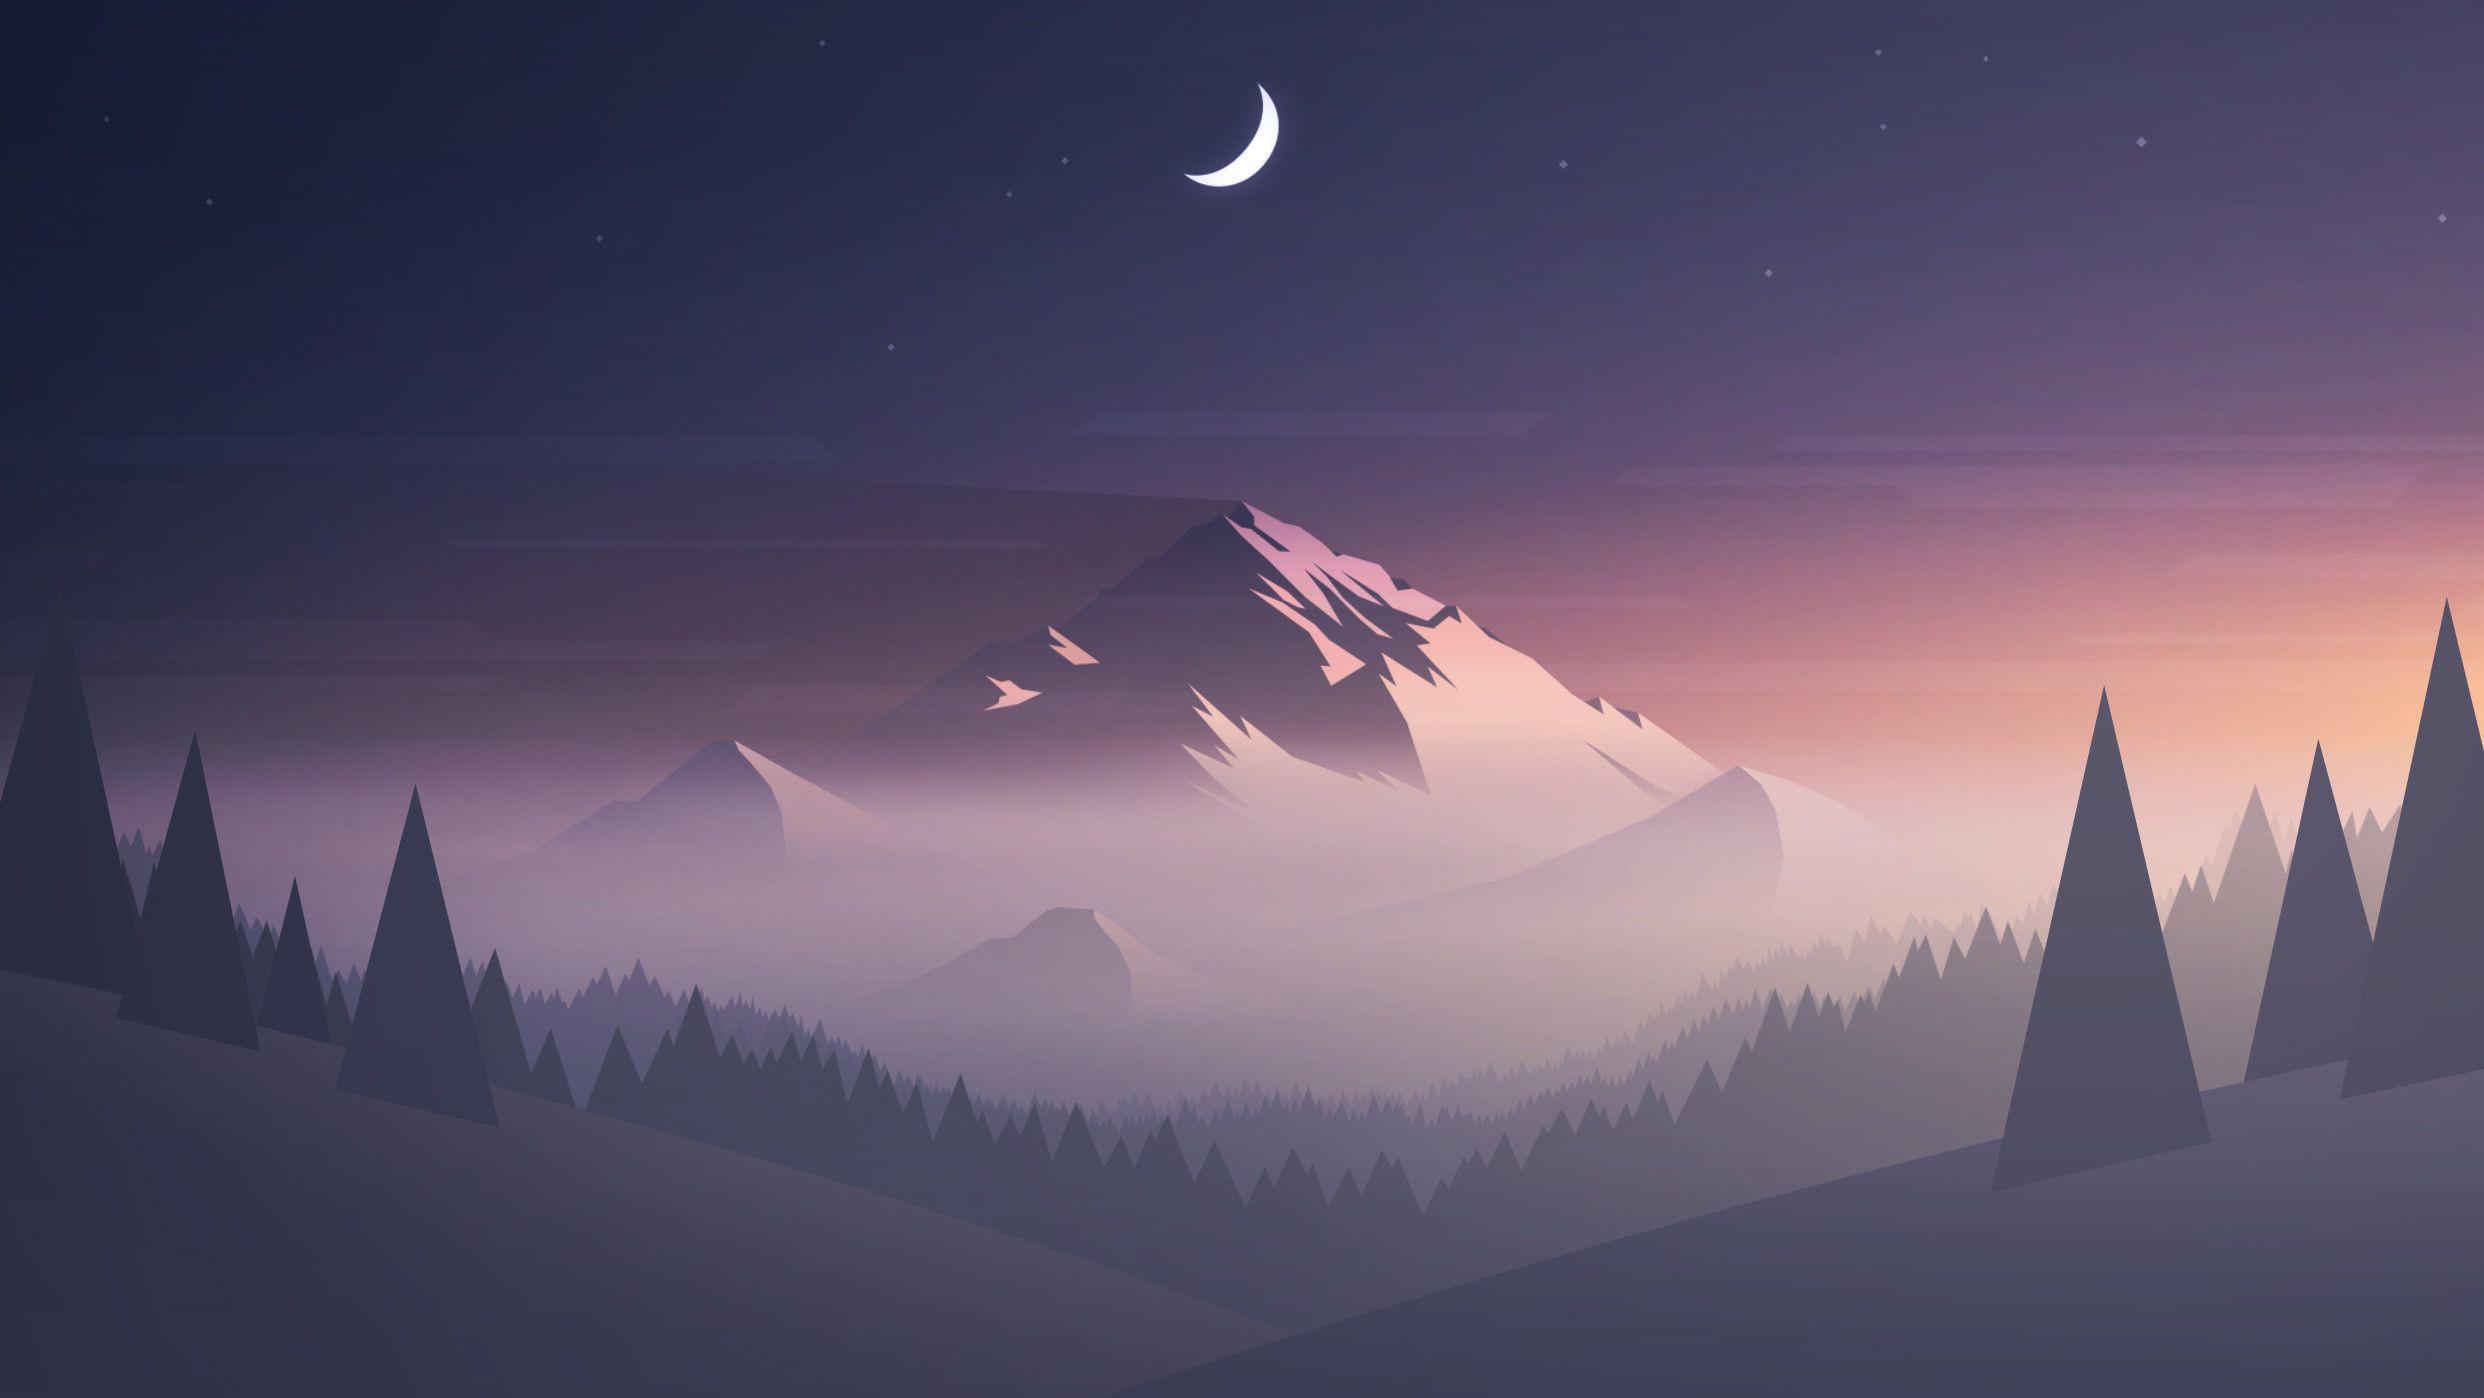 Minimalist Mountain Wallpapers Top Free Minimalist